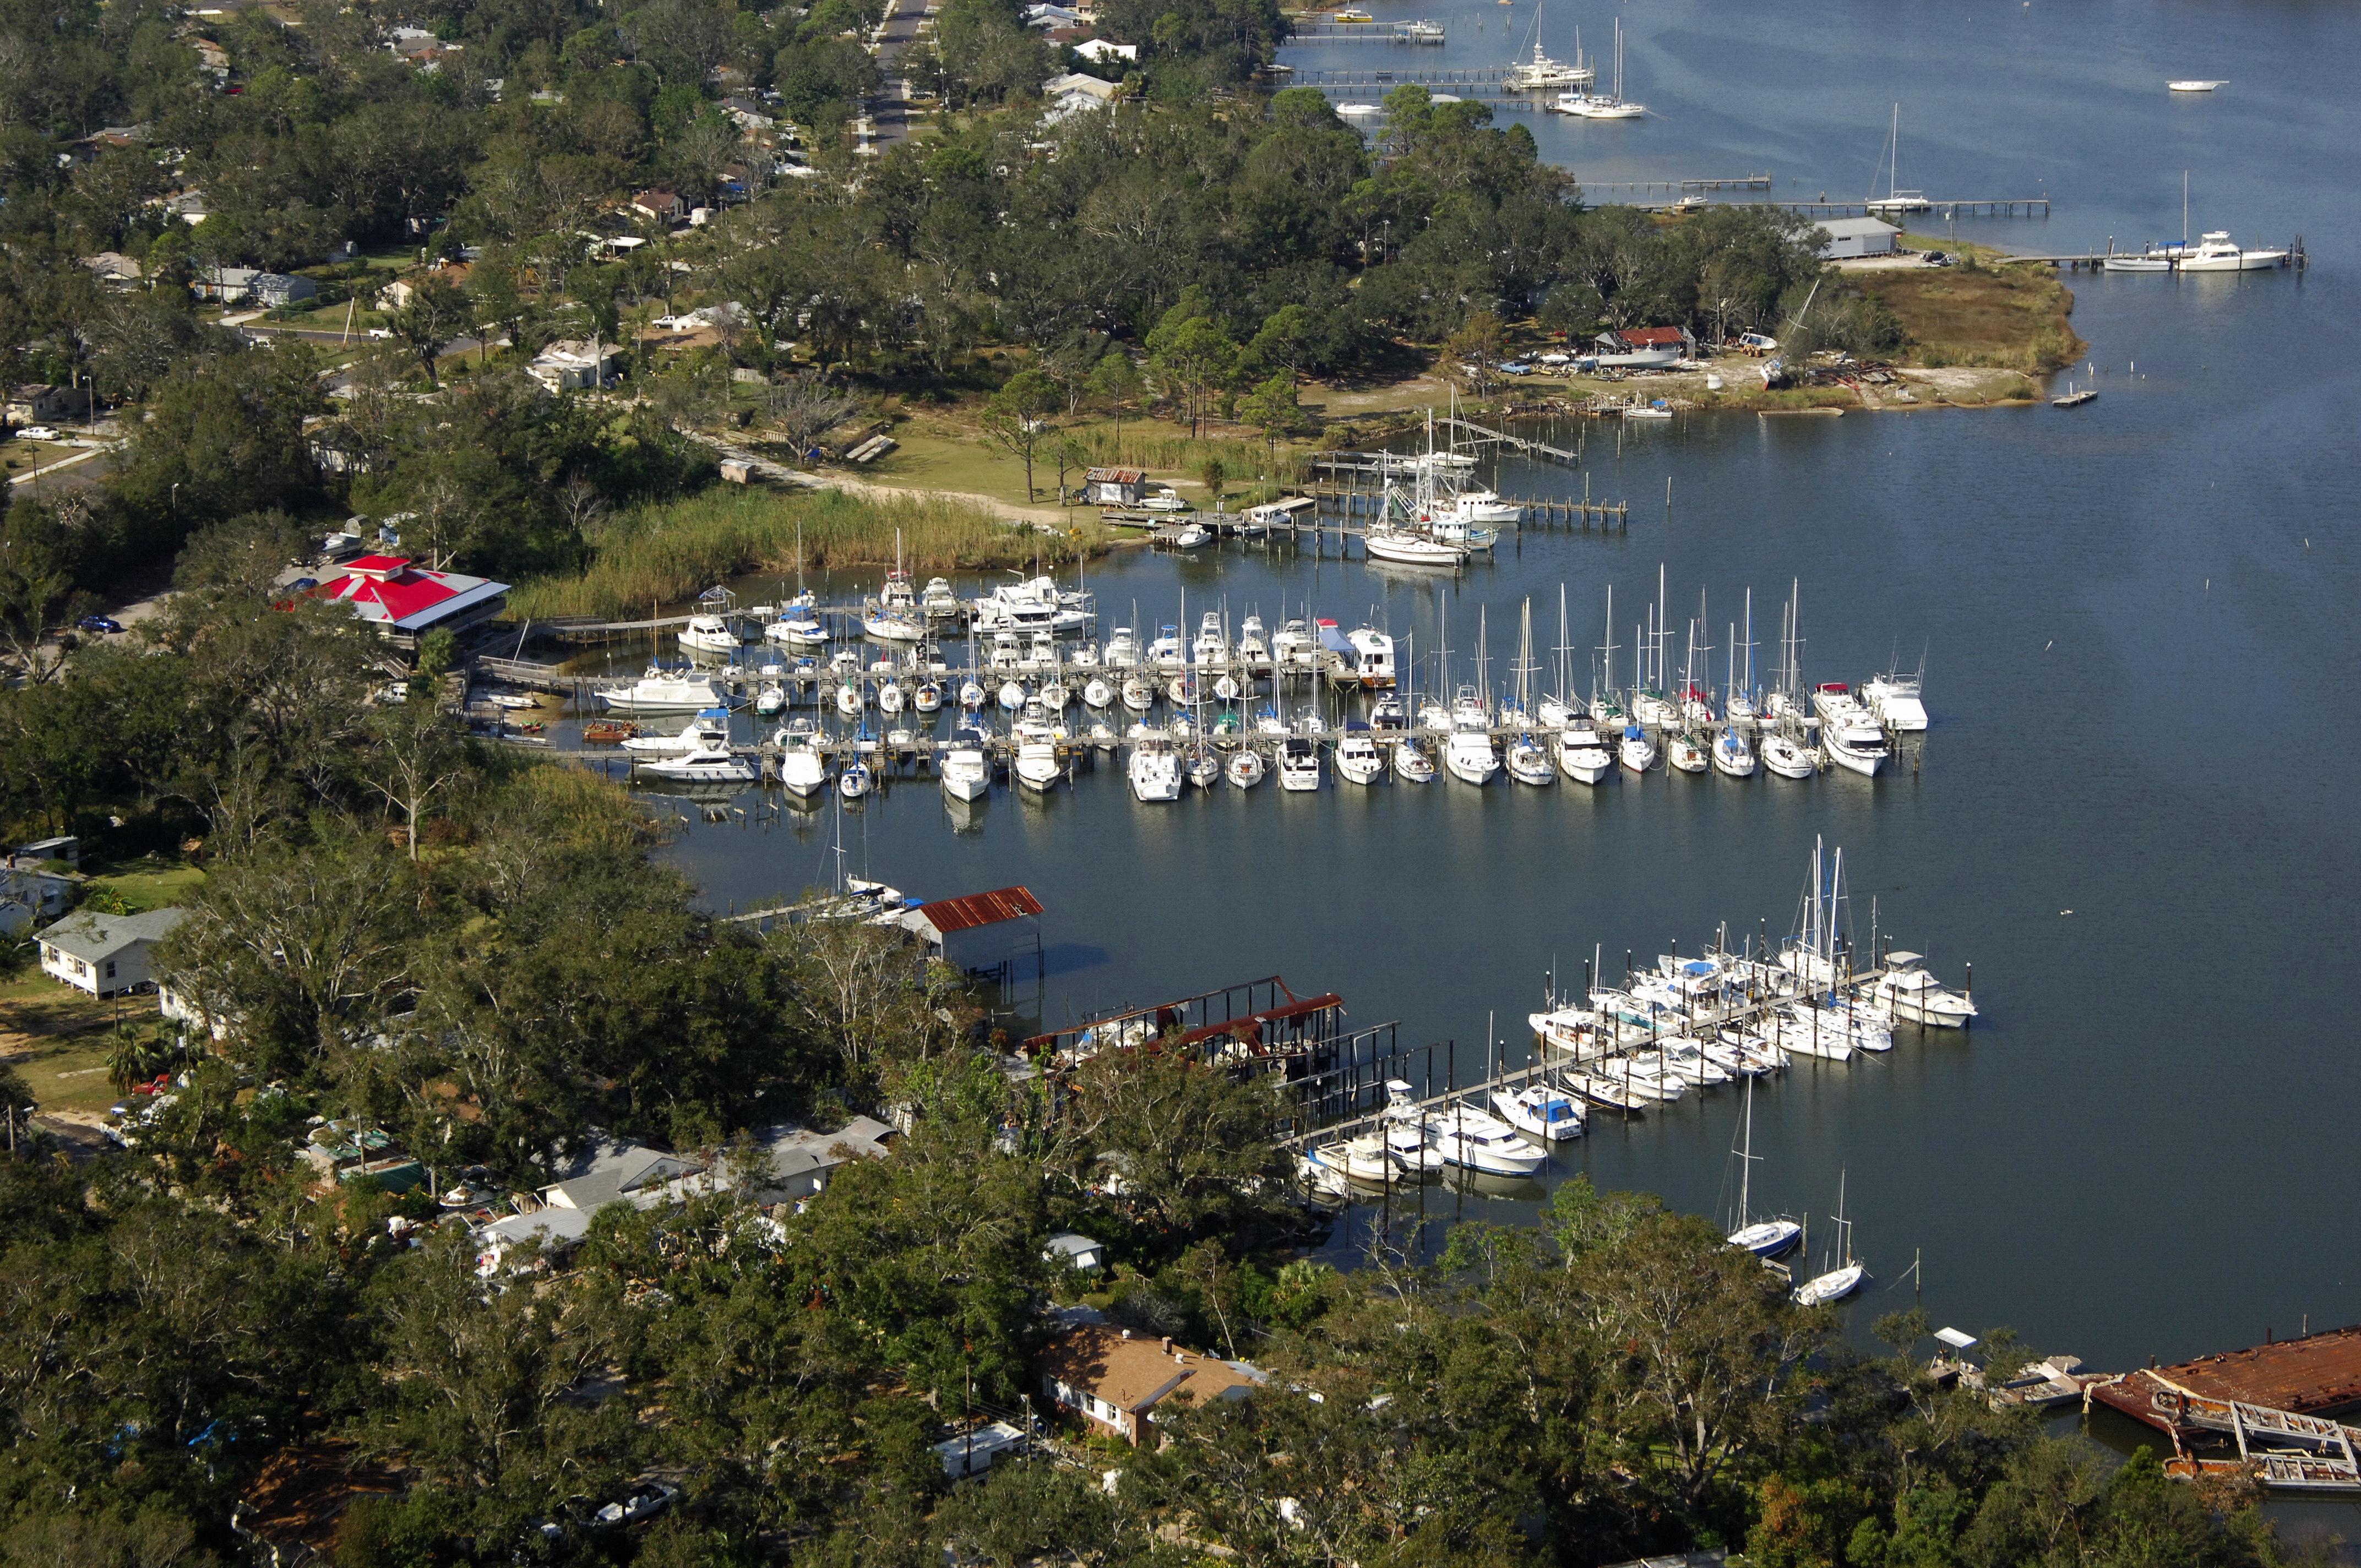 Island Cove Marina in Pensacola, FL, United States ...